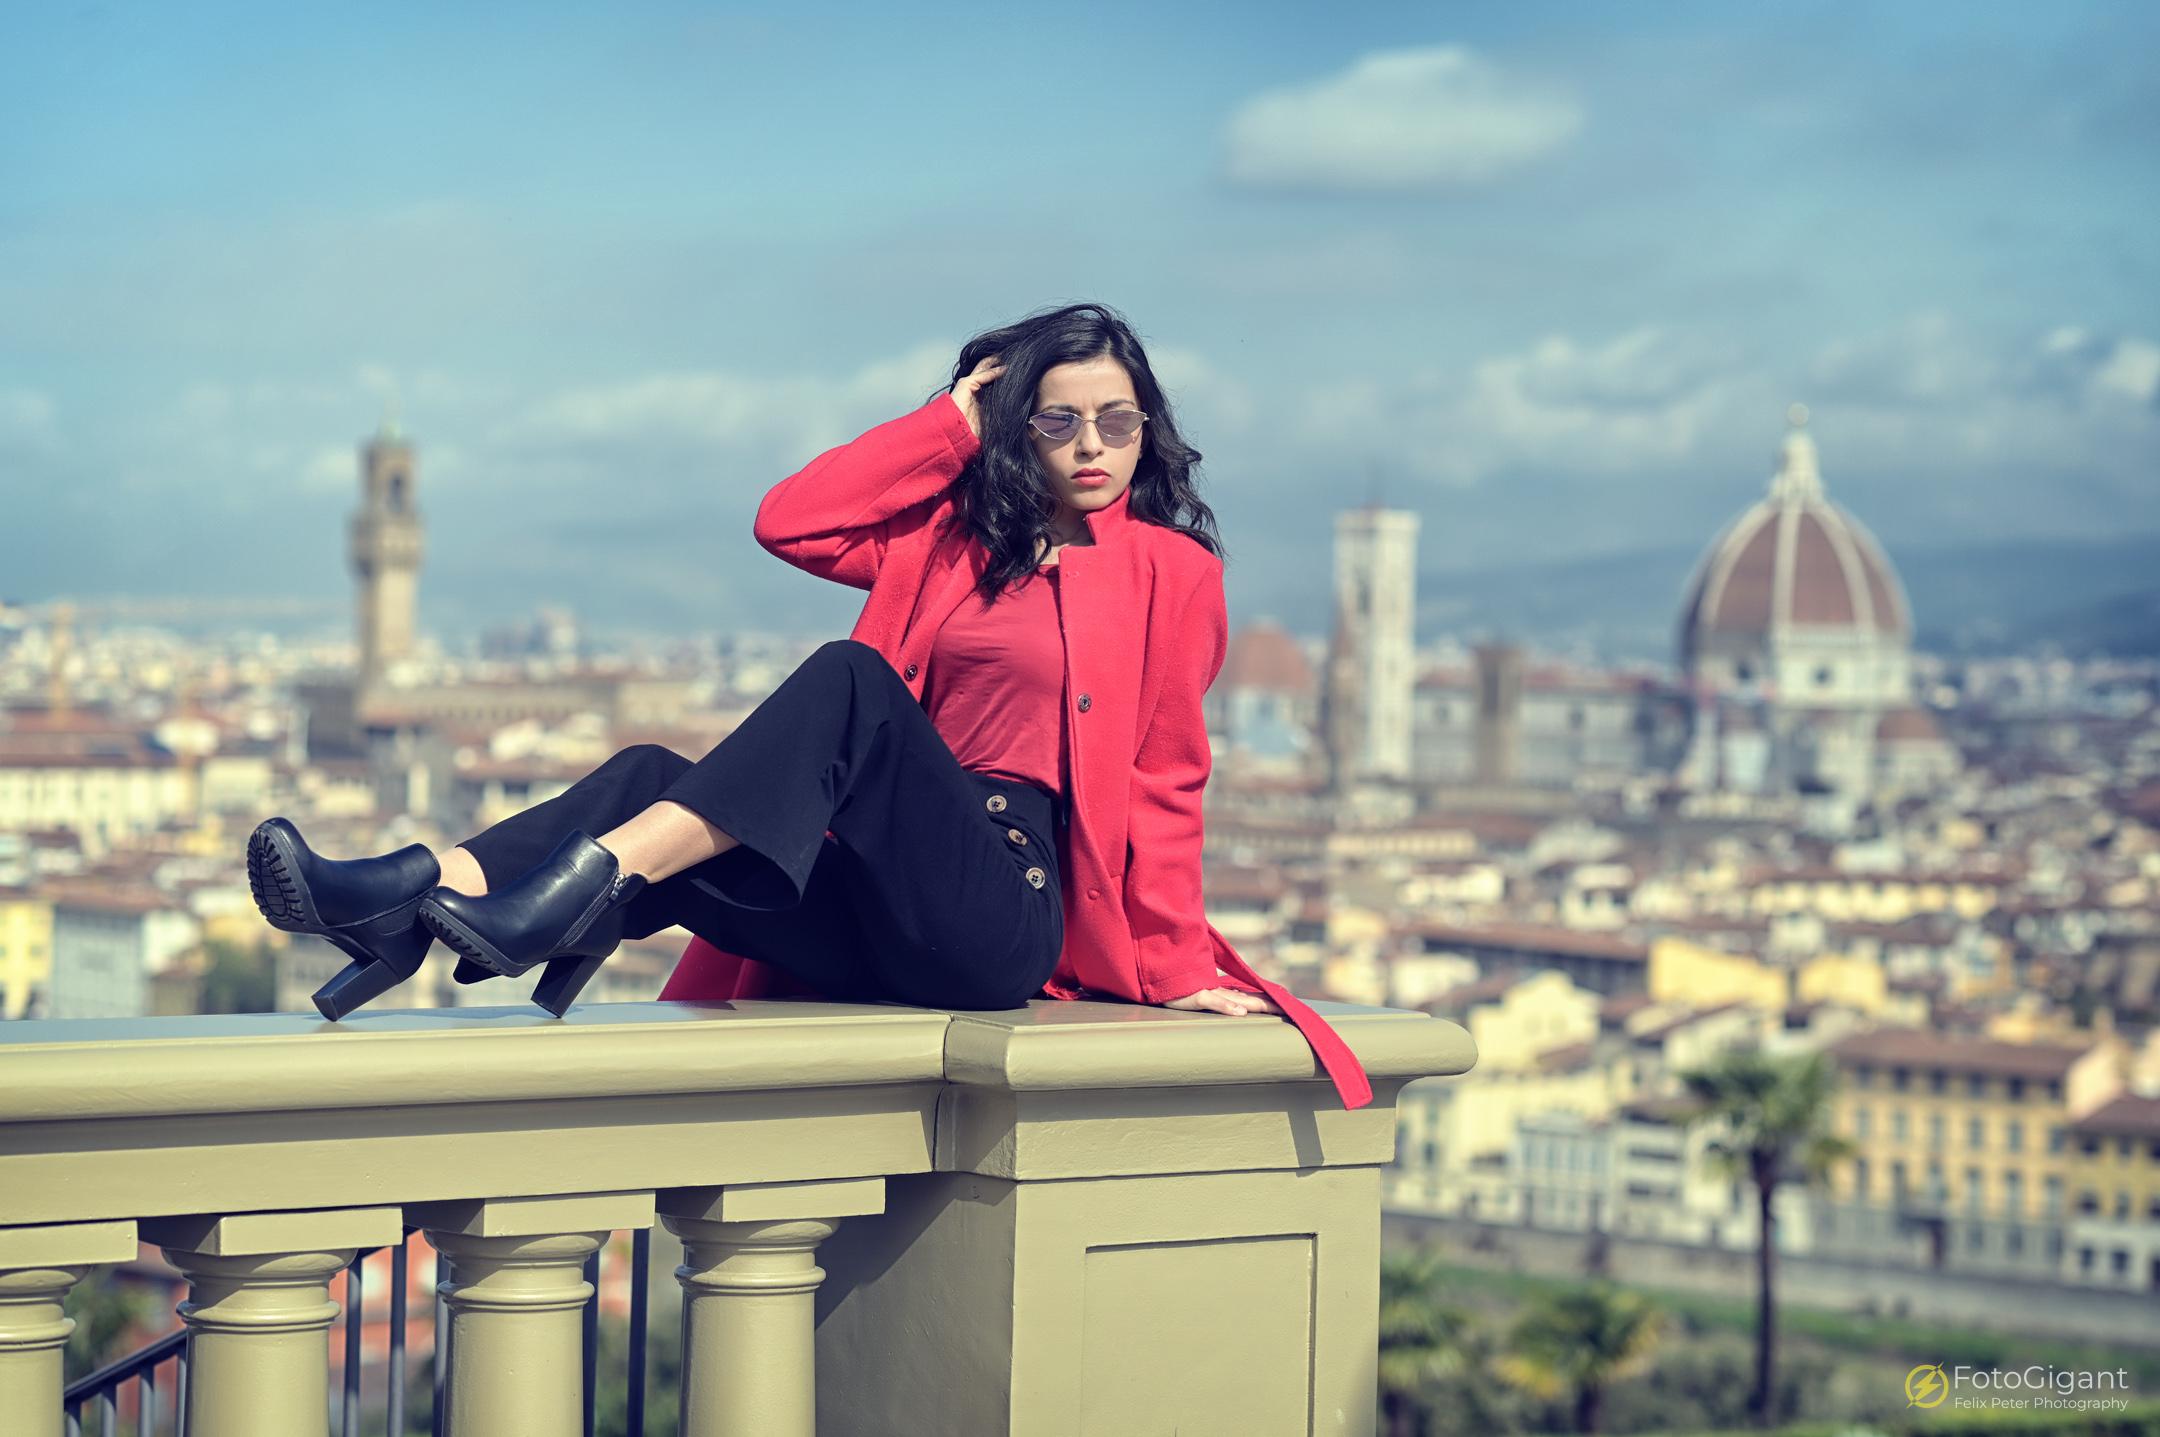 WS_2019_Firenze_Day1_0183_edit1_fb.jpg